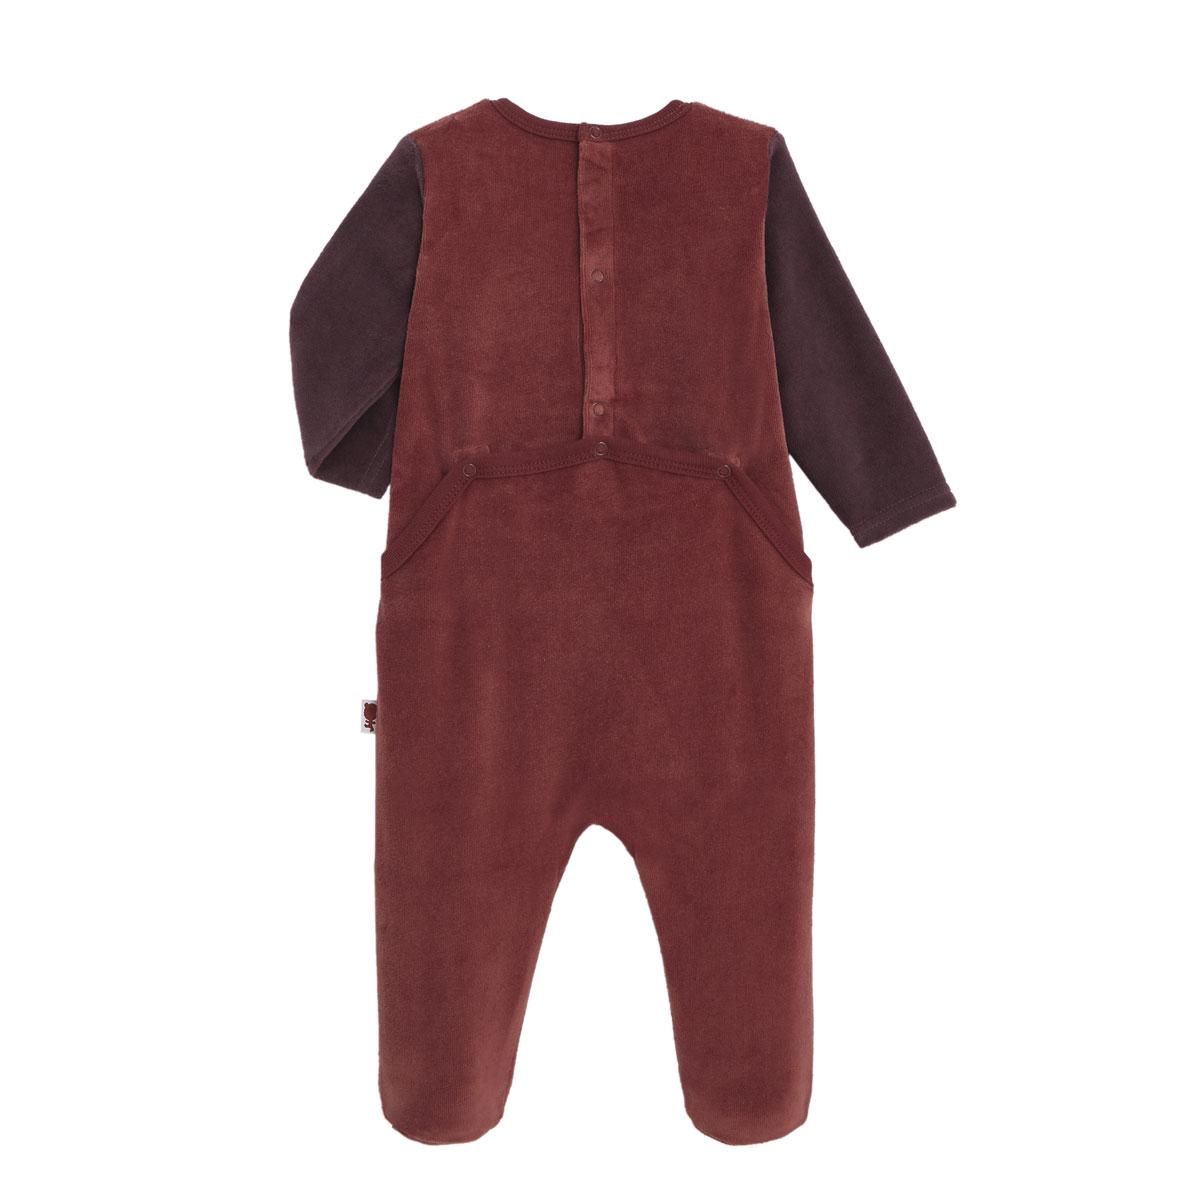 Pyjama bébé en velours contenant du coton bio Loupfoque dos